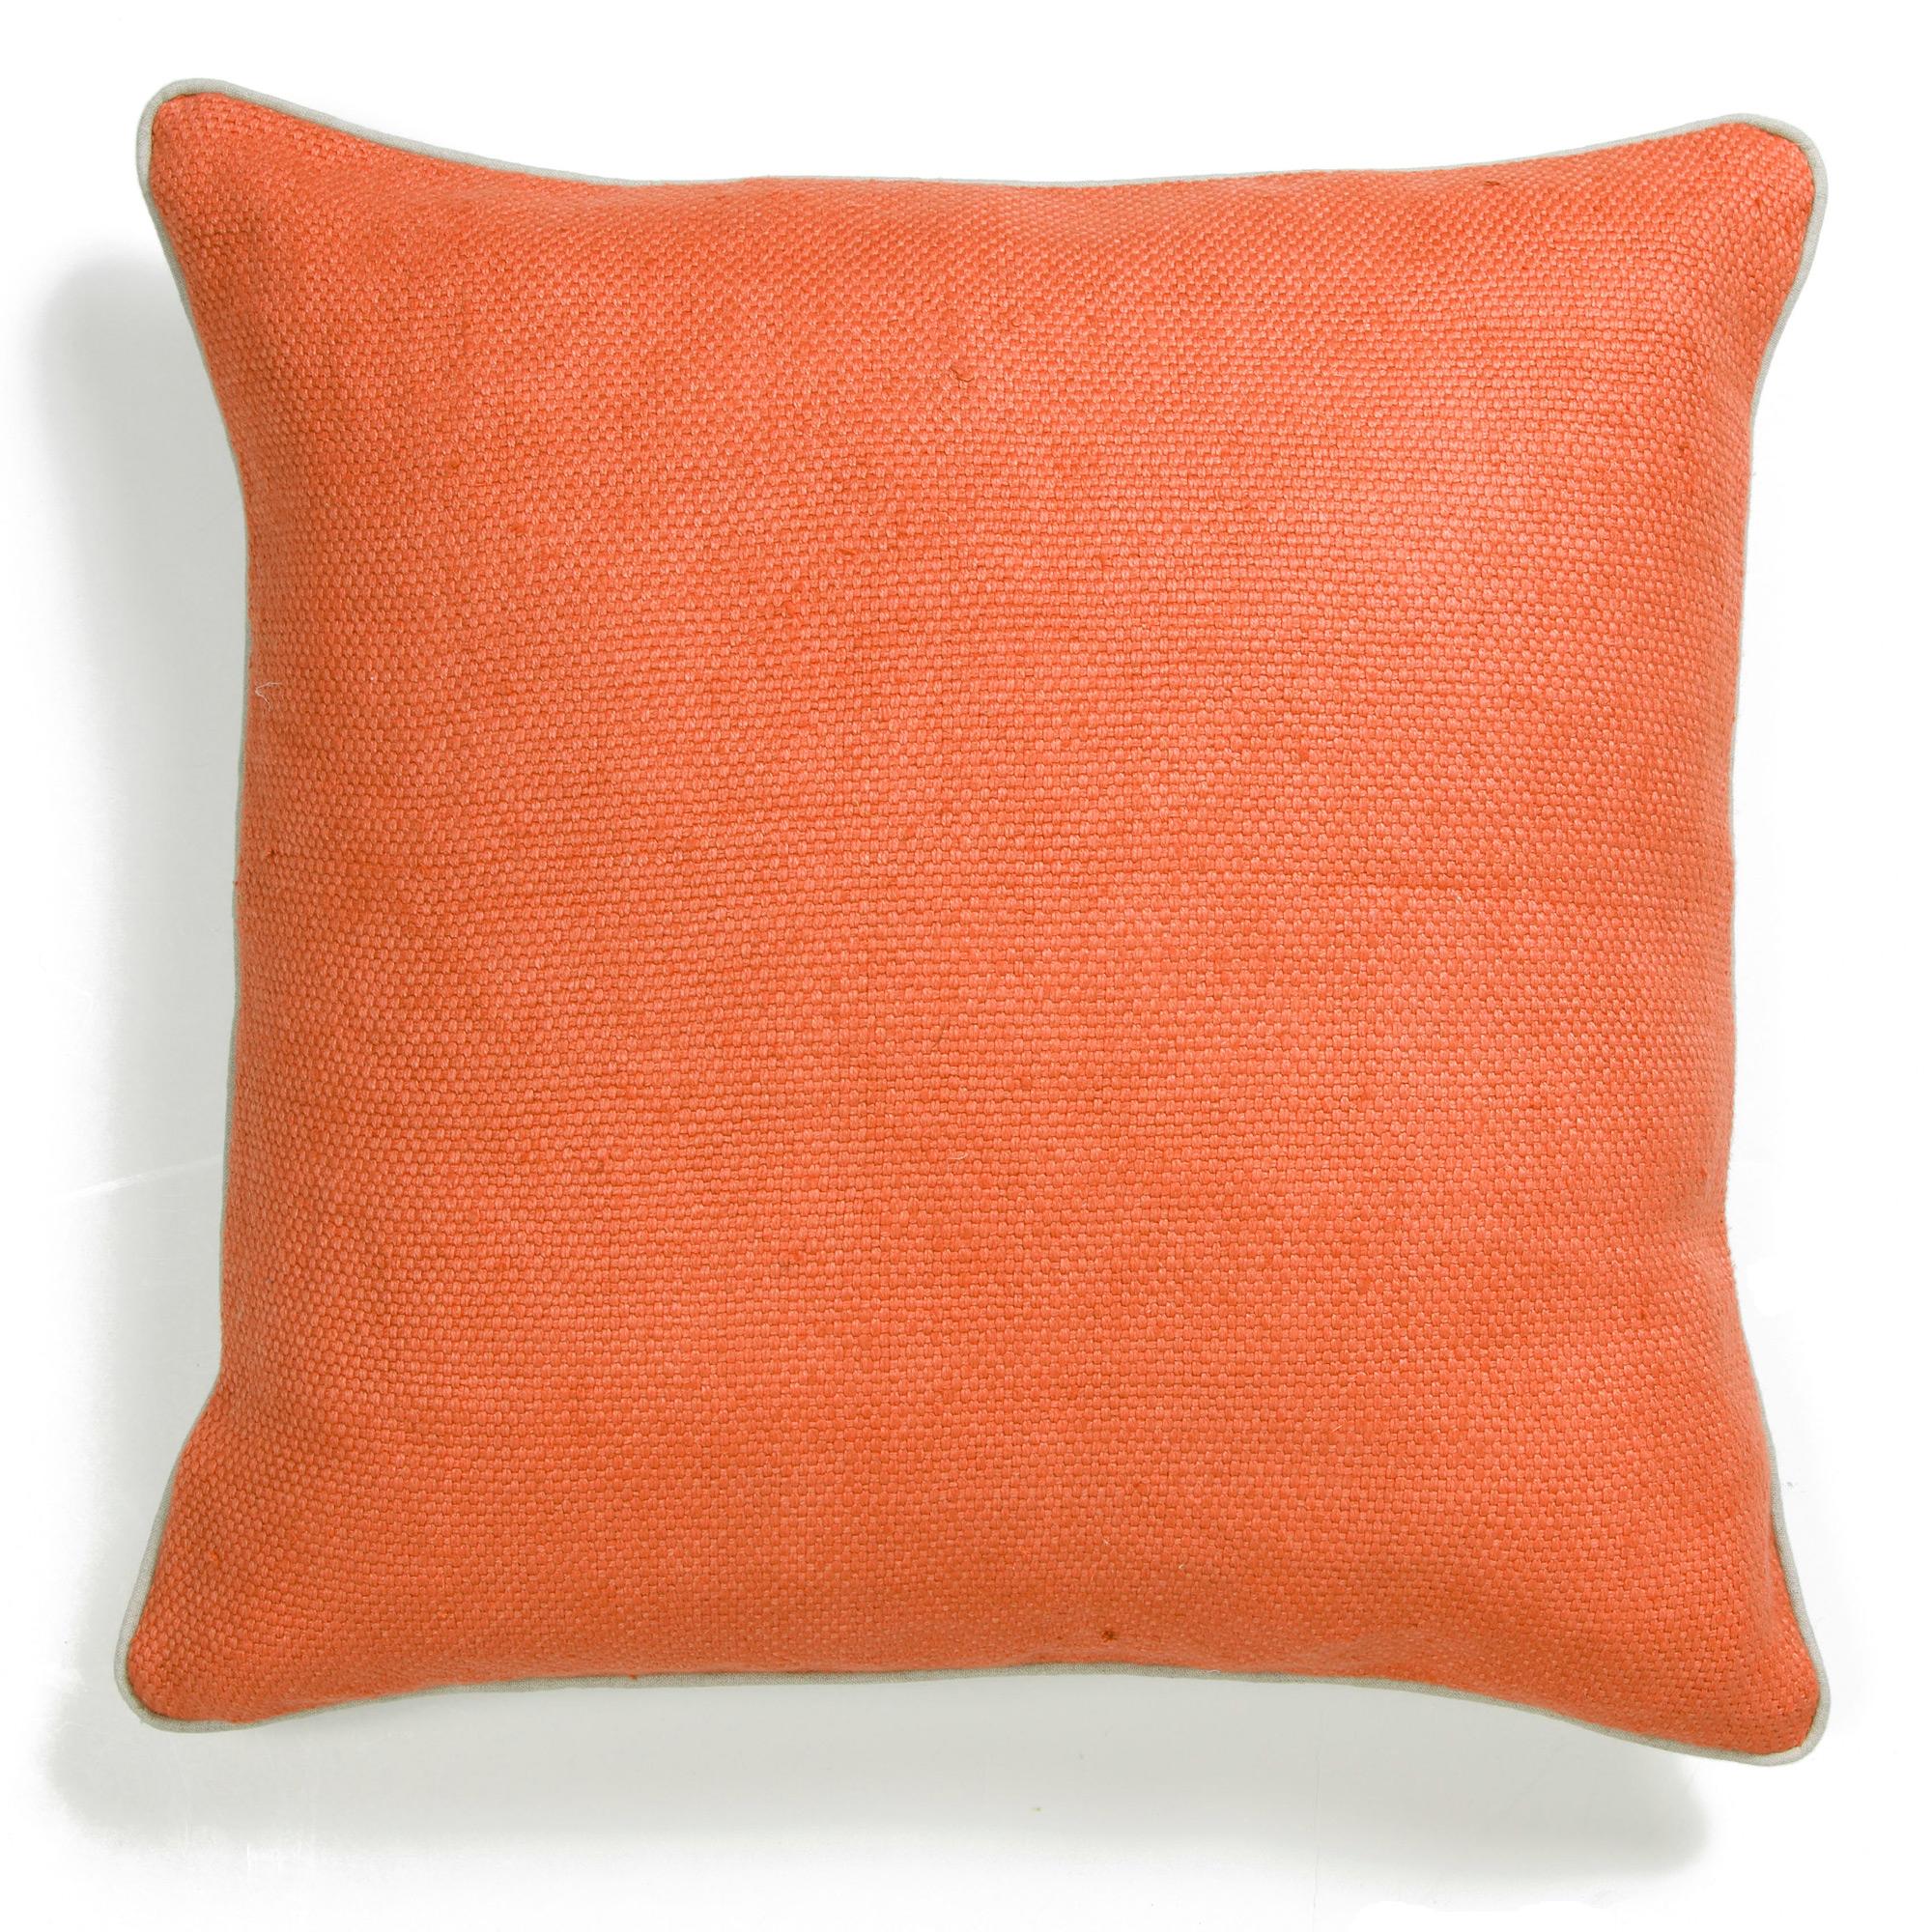 Throw Pillows Home : Orange Willow Weave Pillow Gump s